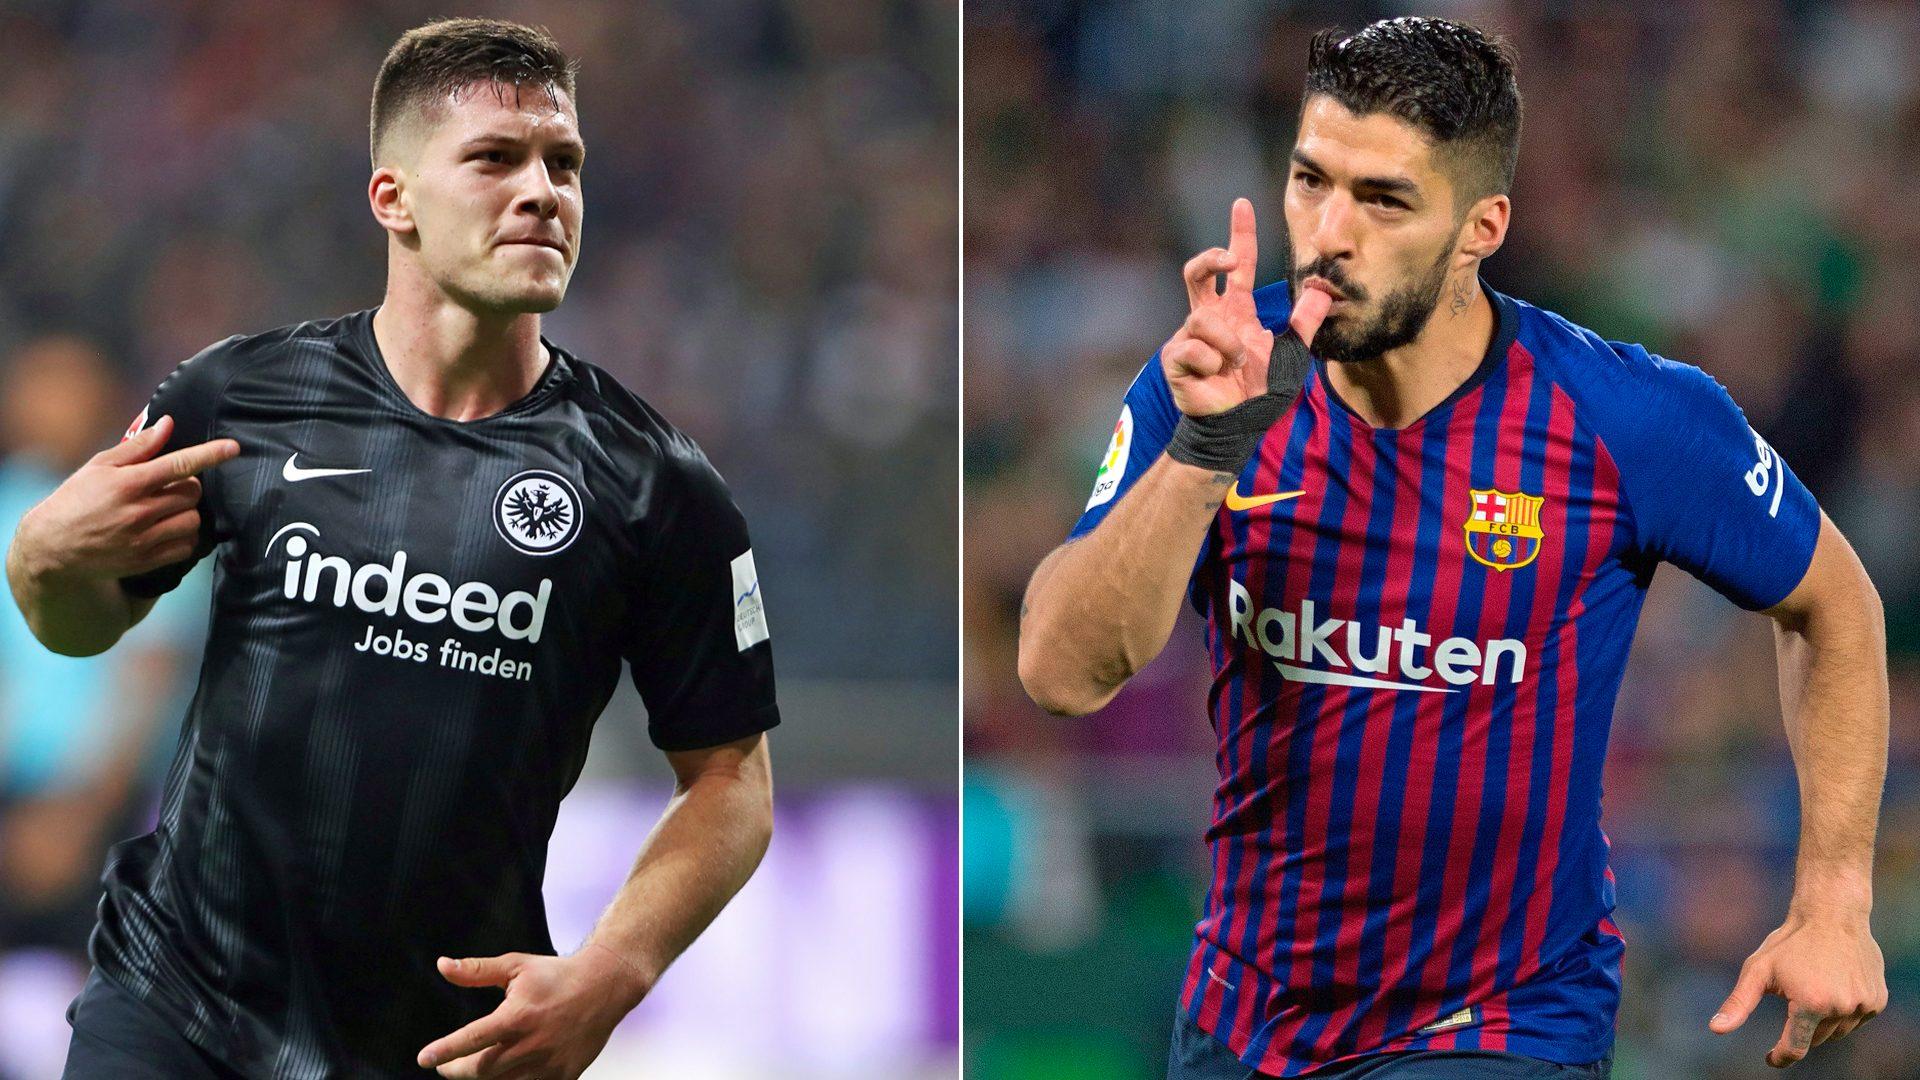 """Luka Jovic is like Luis Suarez"" – Serbia coach Krstajic"